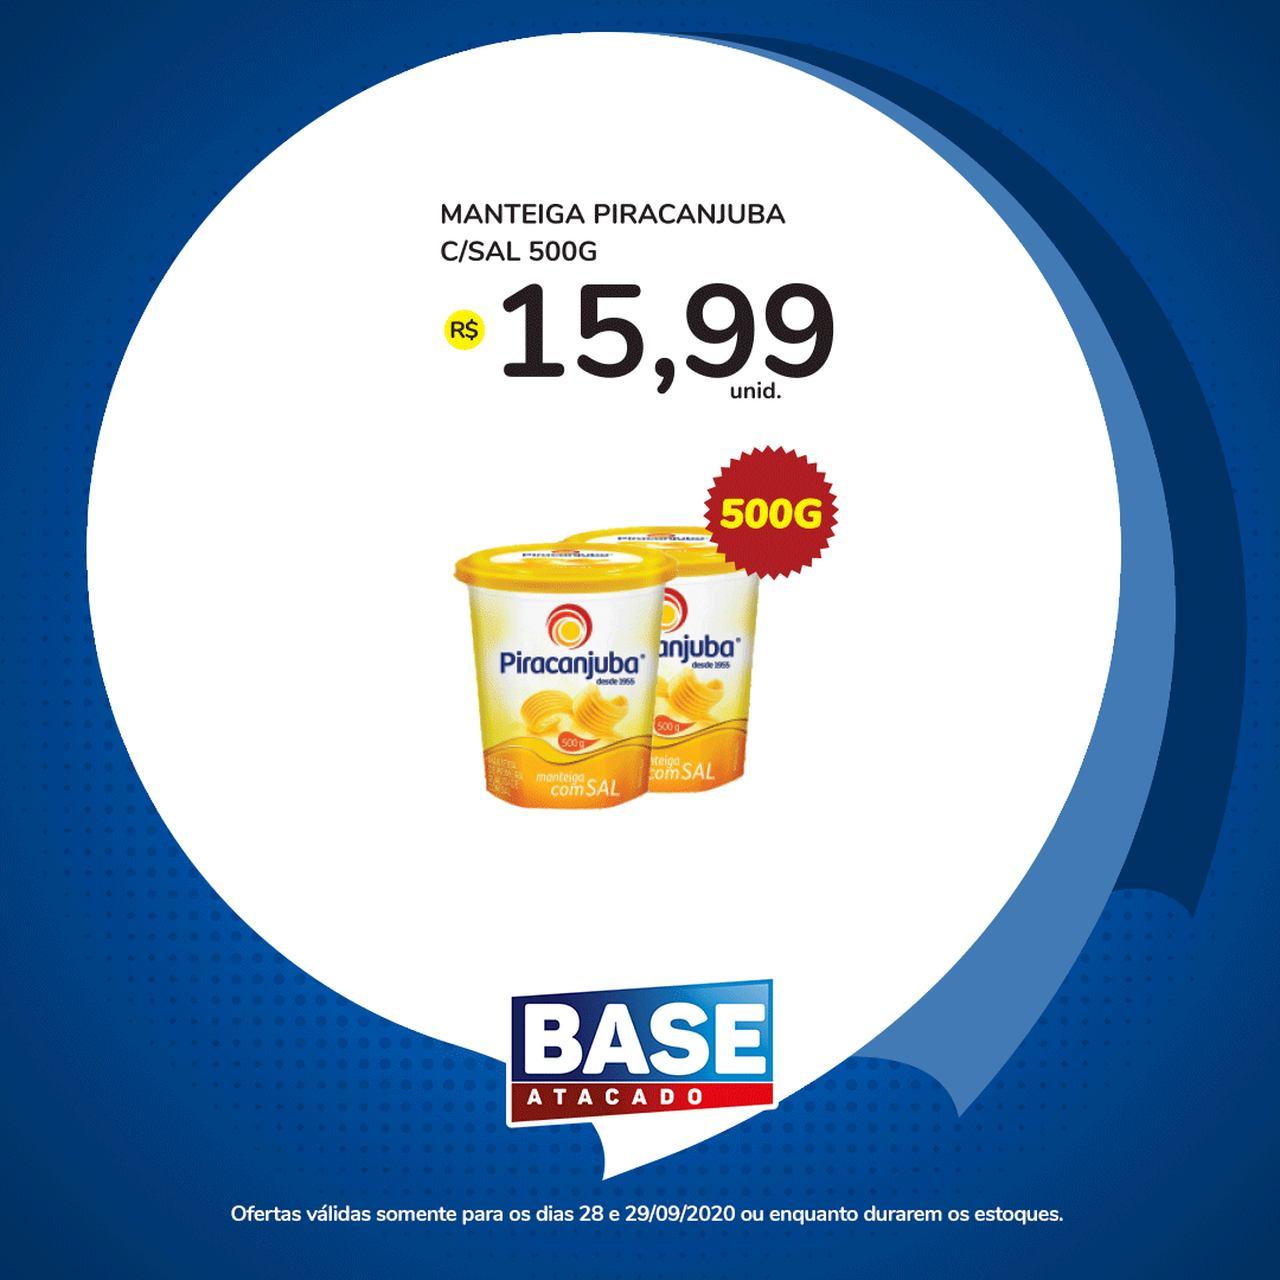 Ofertas de supermercado BASE atacado segunda e terça de super ofertas vence 29-09-9